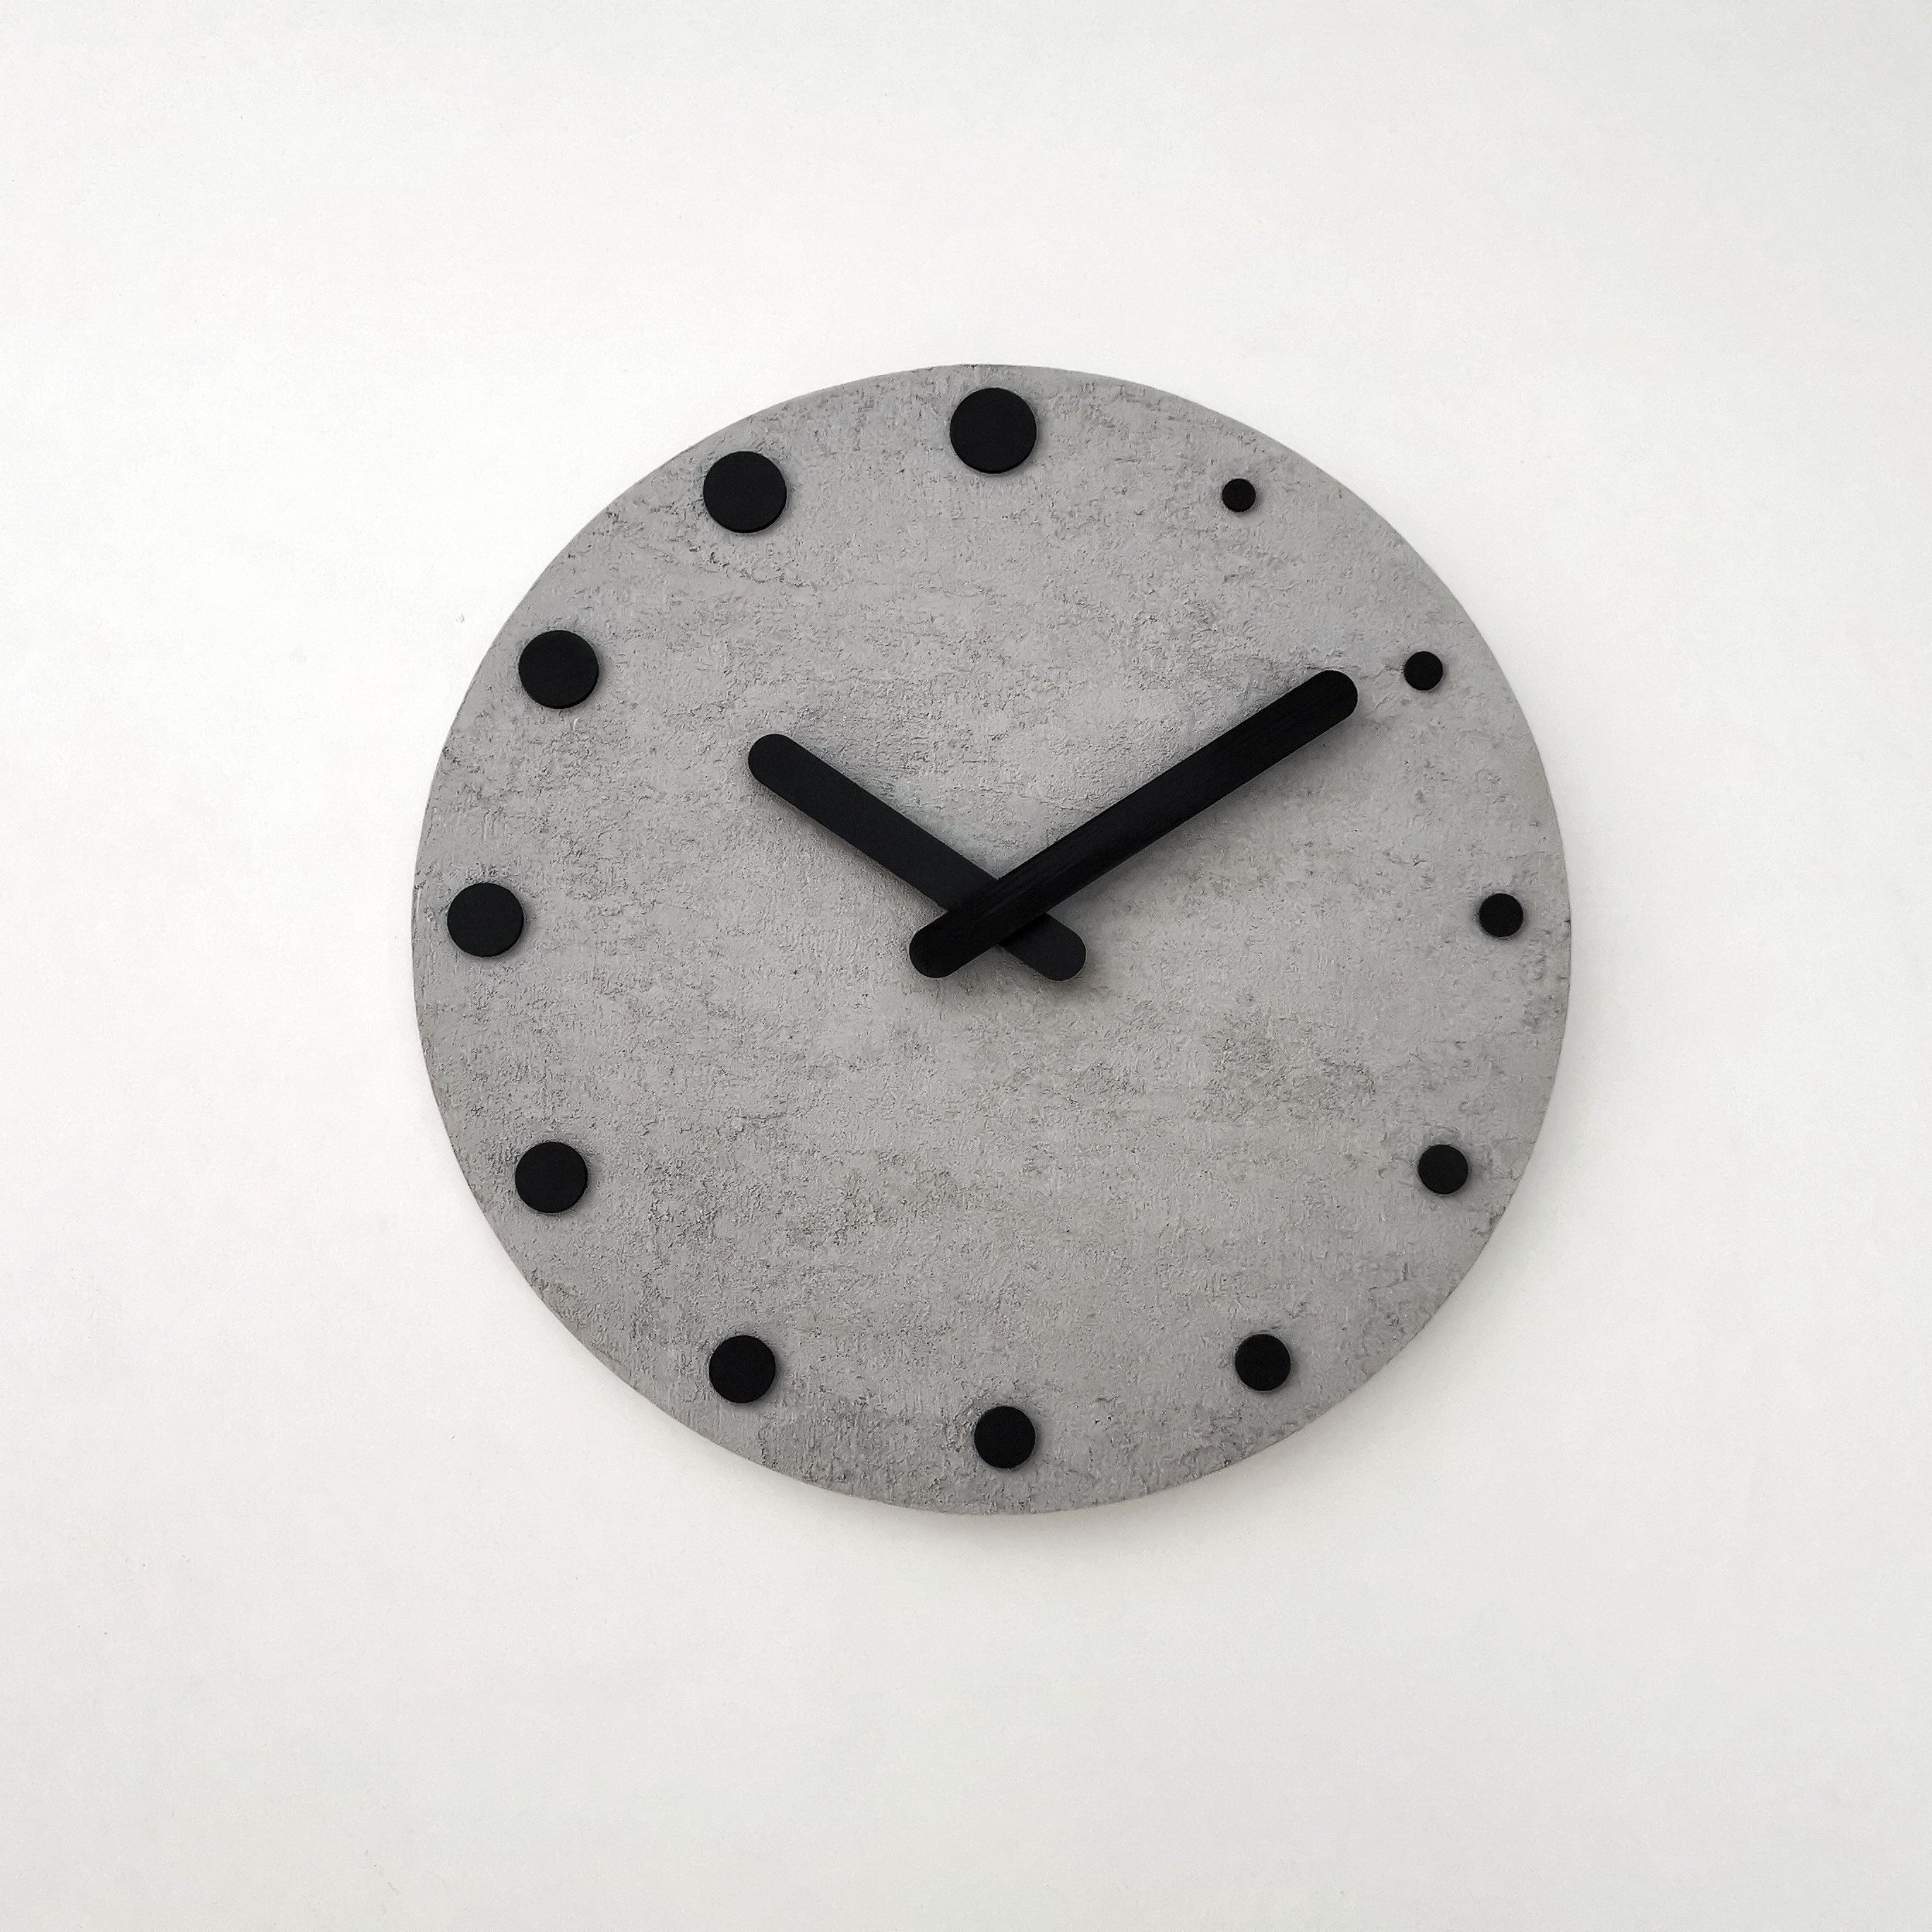 Concrete Wall Clock Etsy In 2020 Wall Clock Concrete Wall Clock